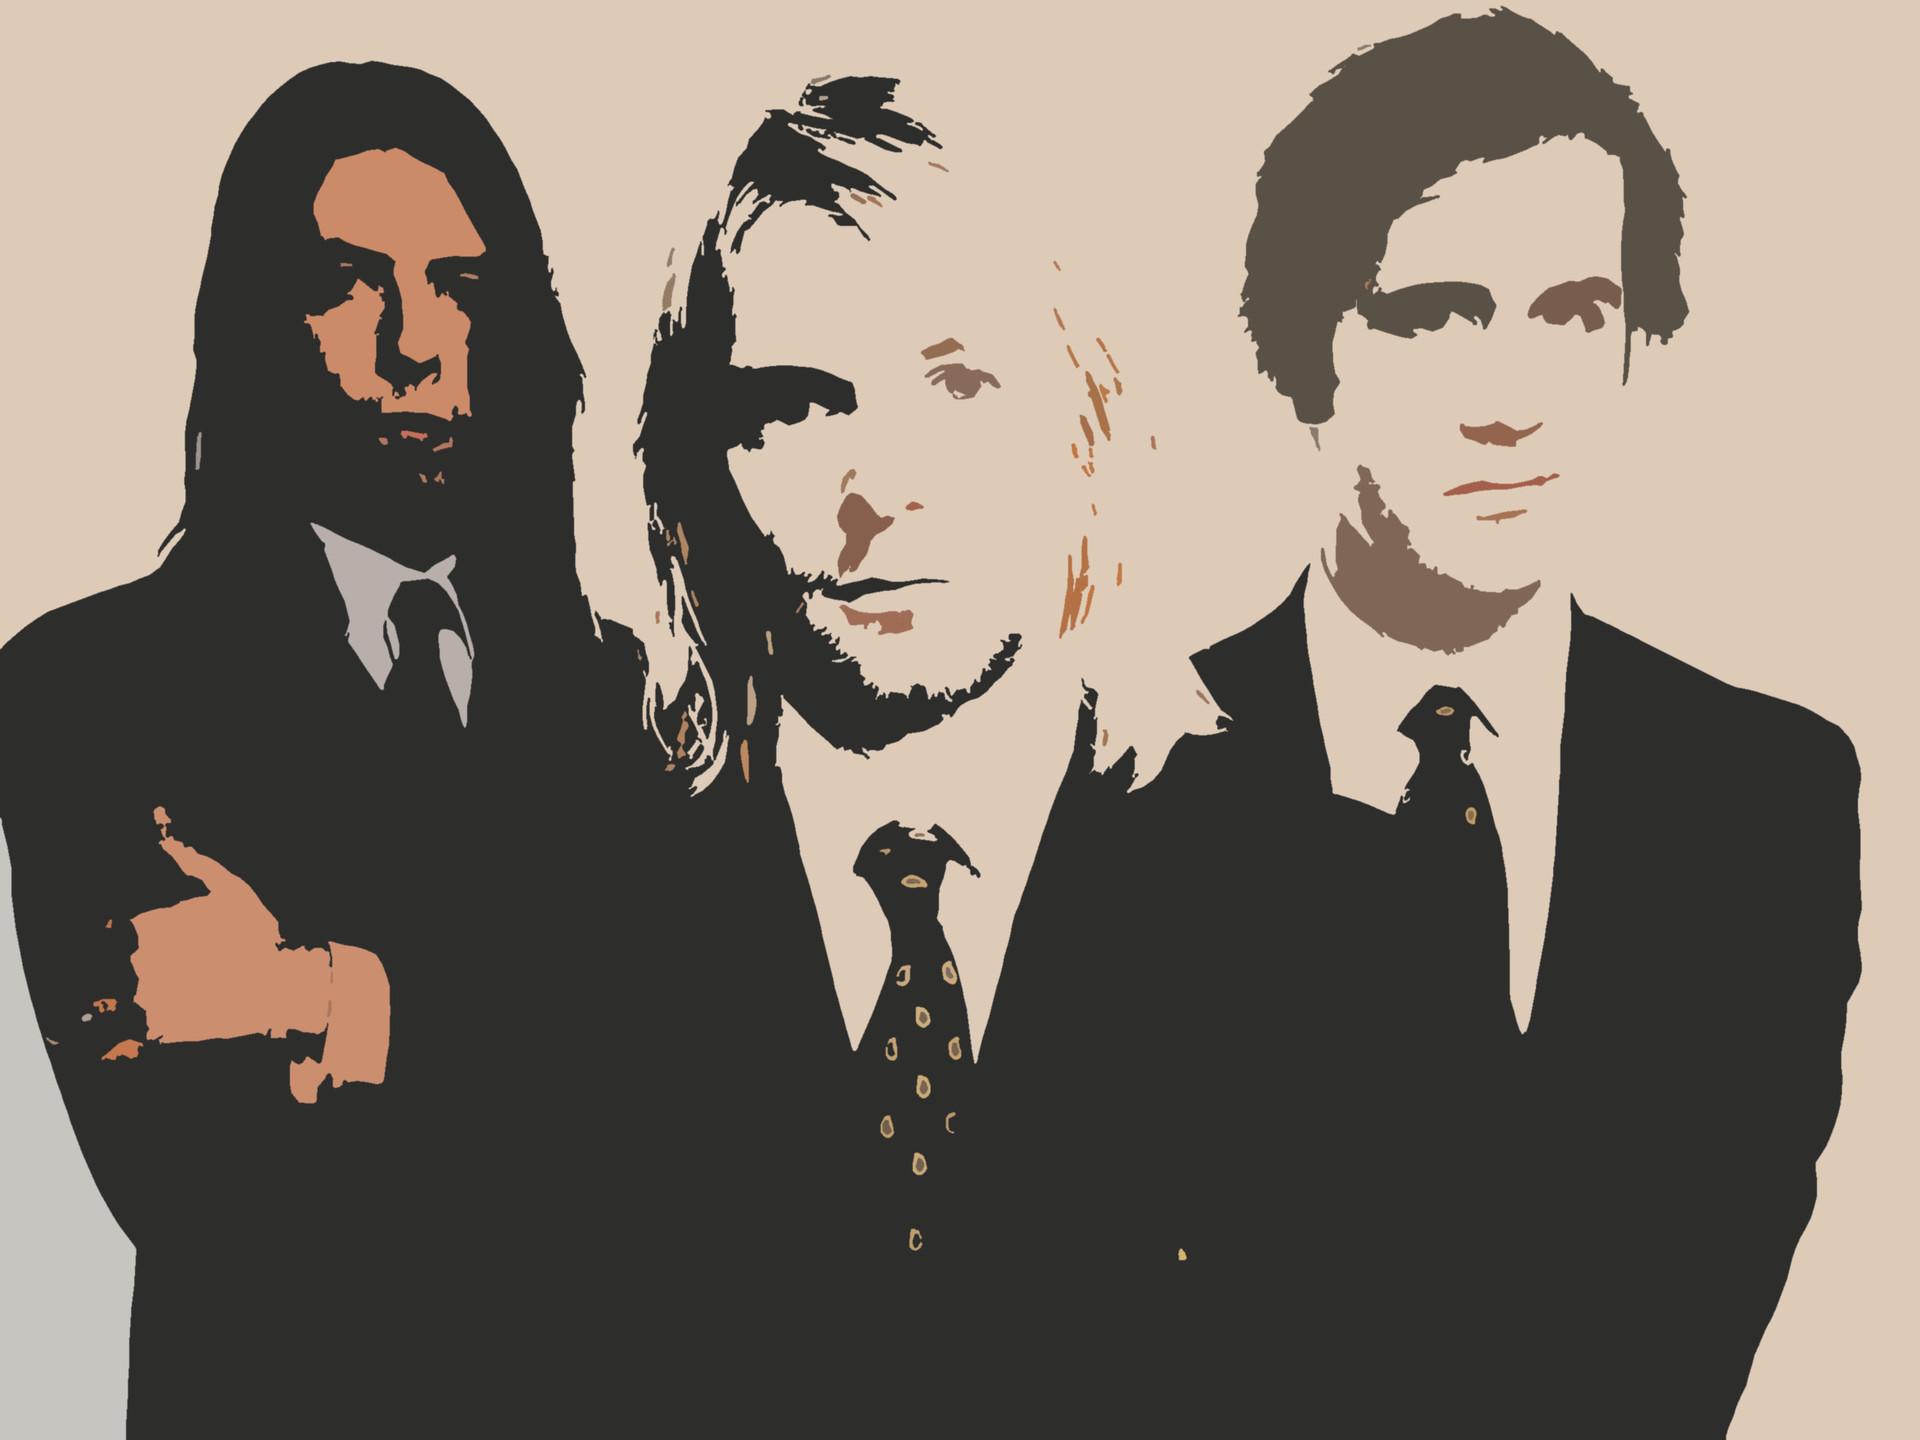 Free Desktop Nirvana Wallpapers Images Download.